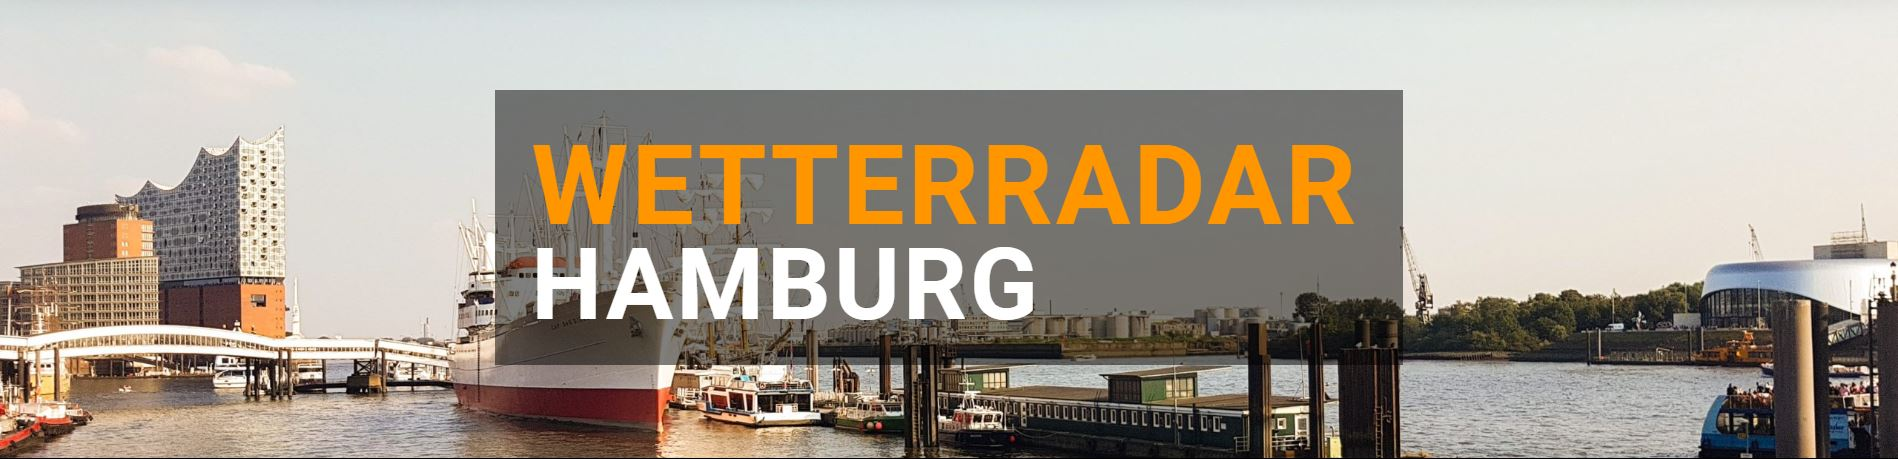 Wetterradar Hamburg groß